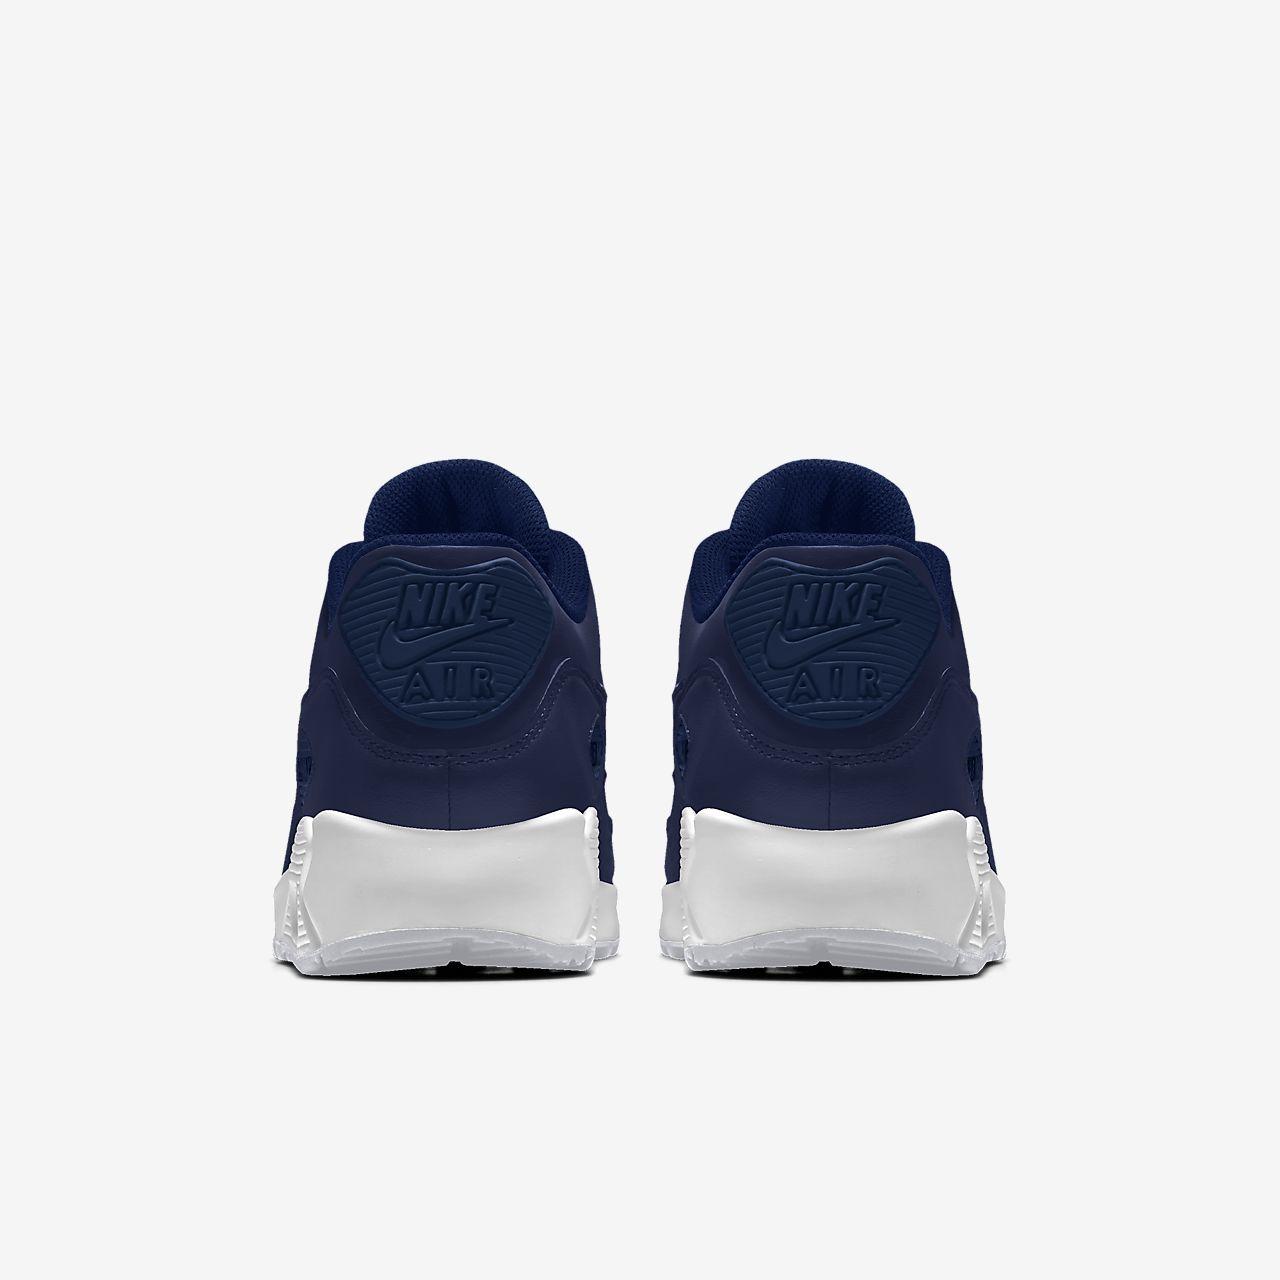 Air Custom Nike You Men's 90 Max Shoe By XZTOuPki